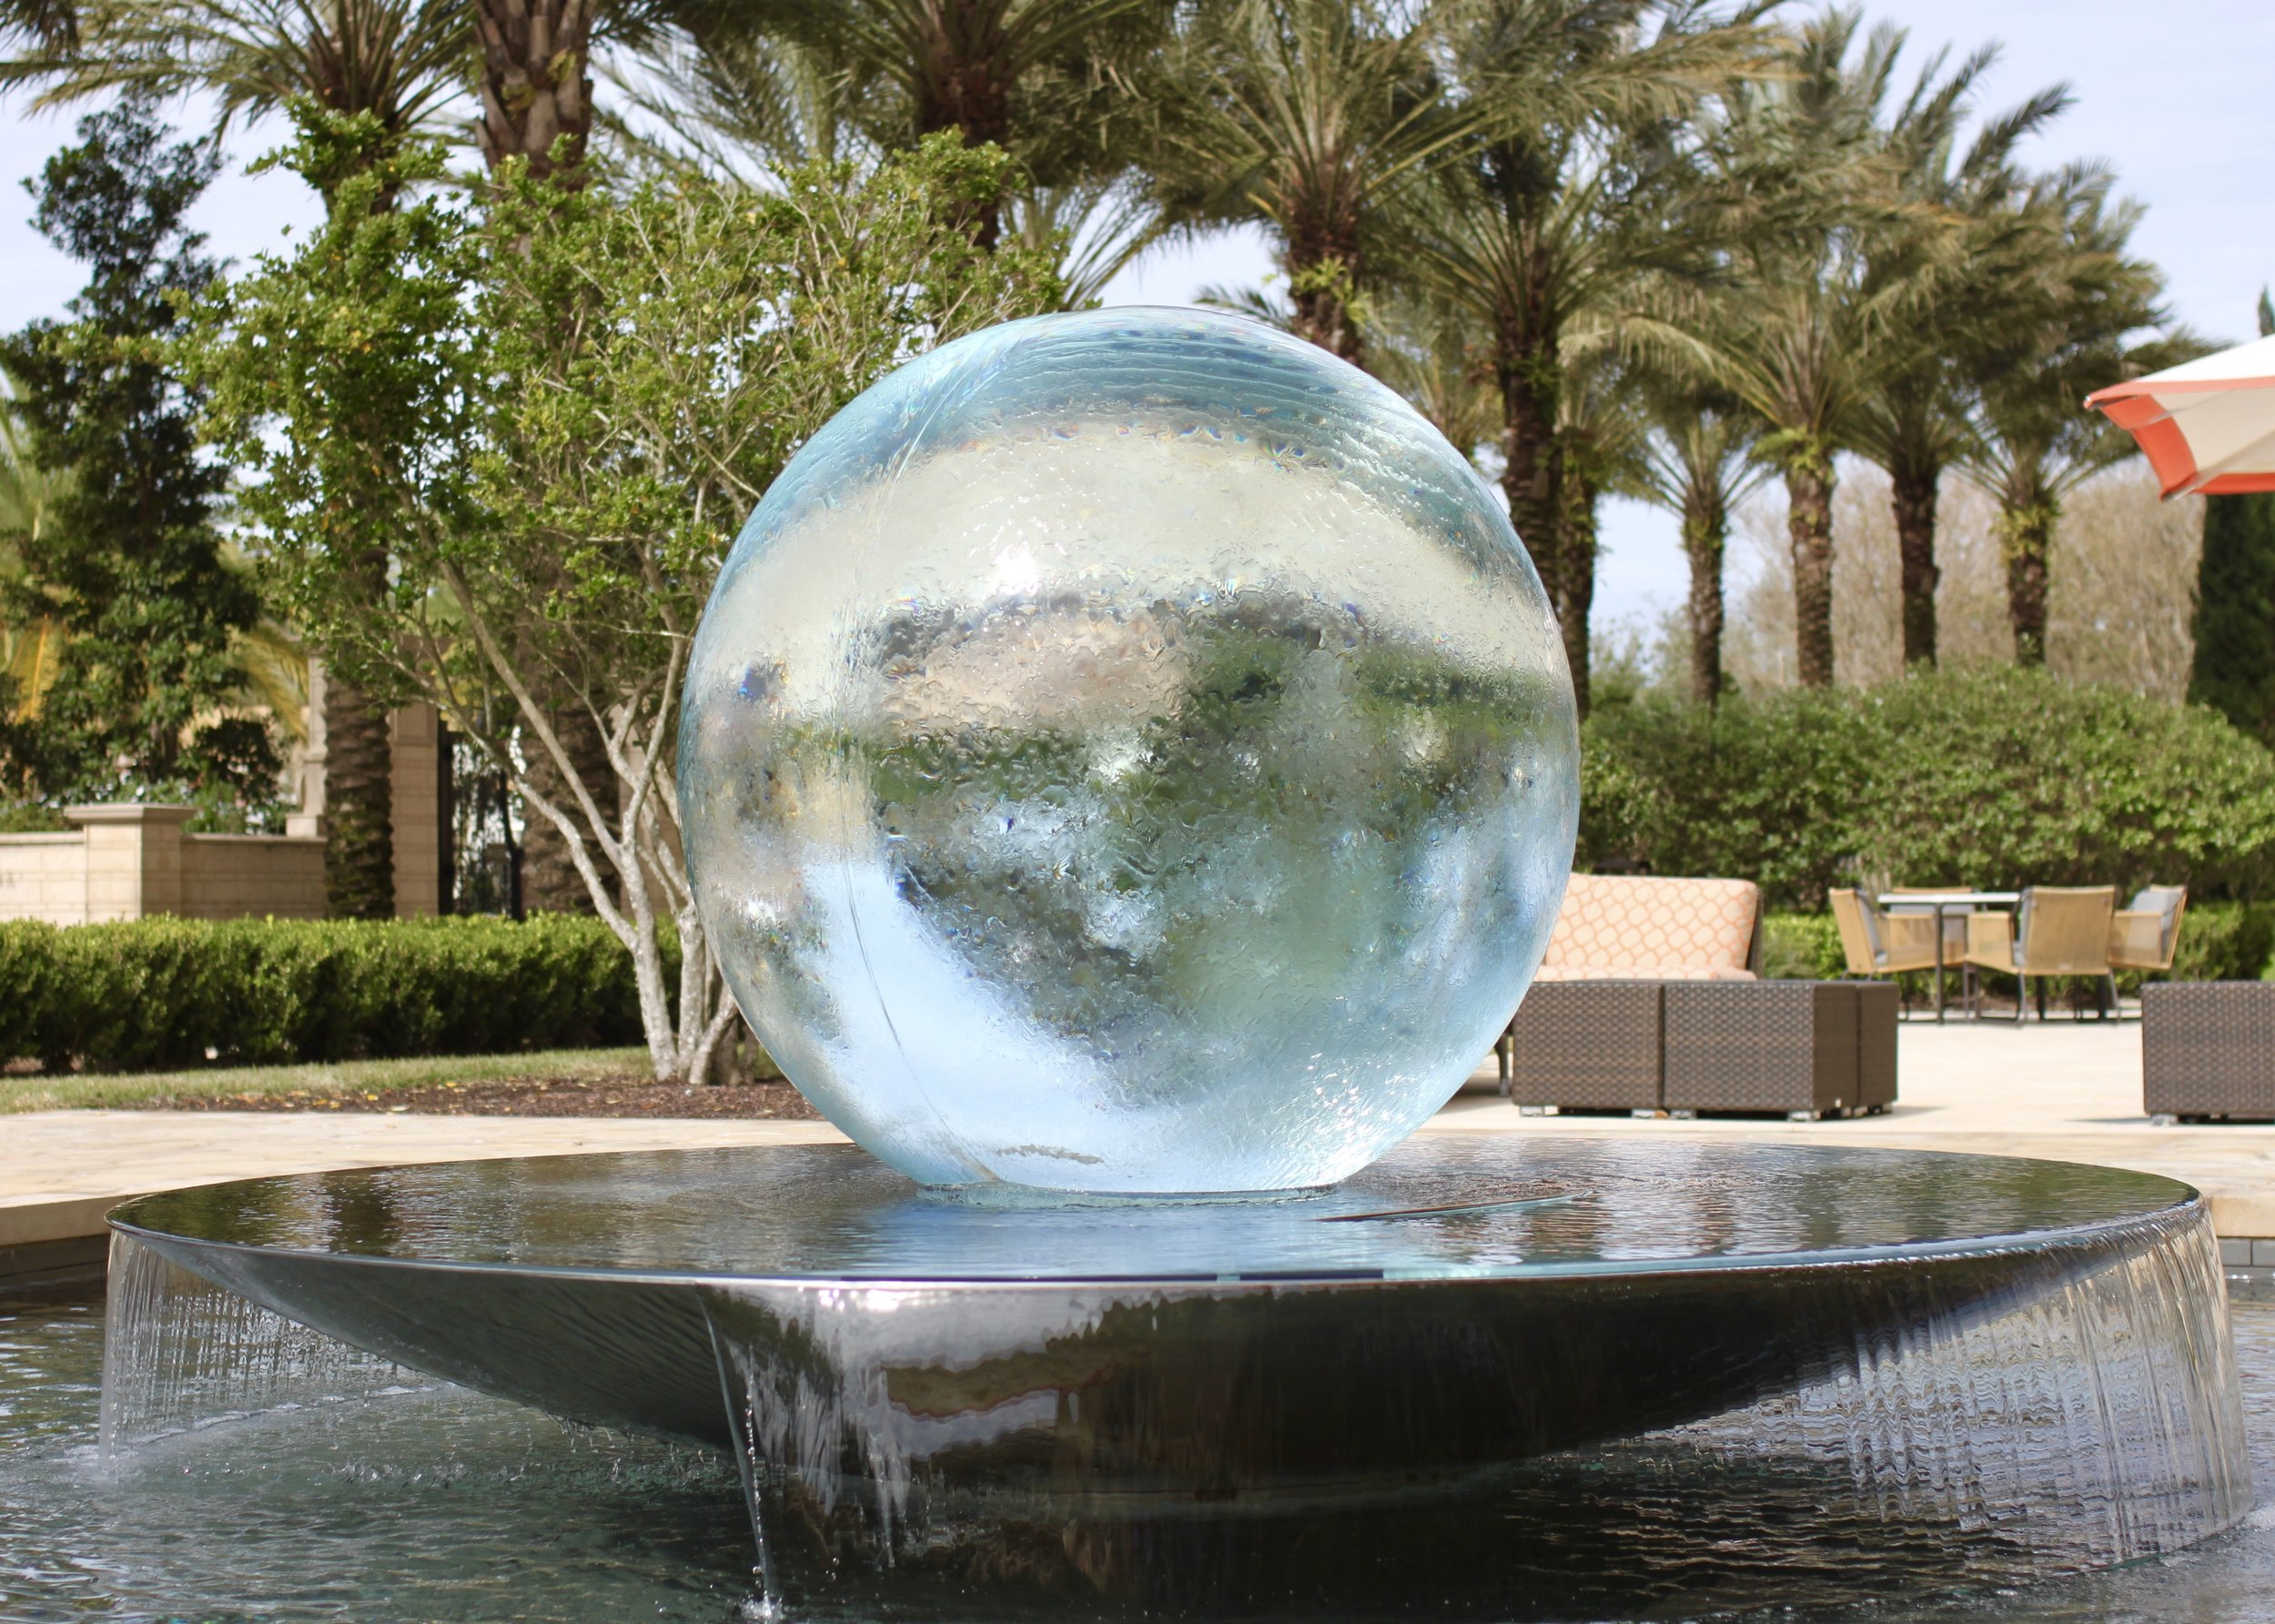 The beautiful giant crystal ball fountain.